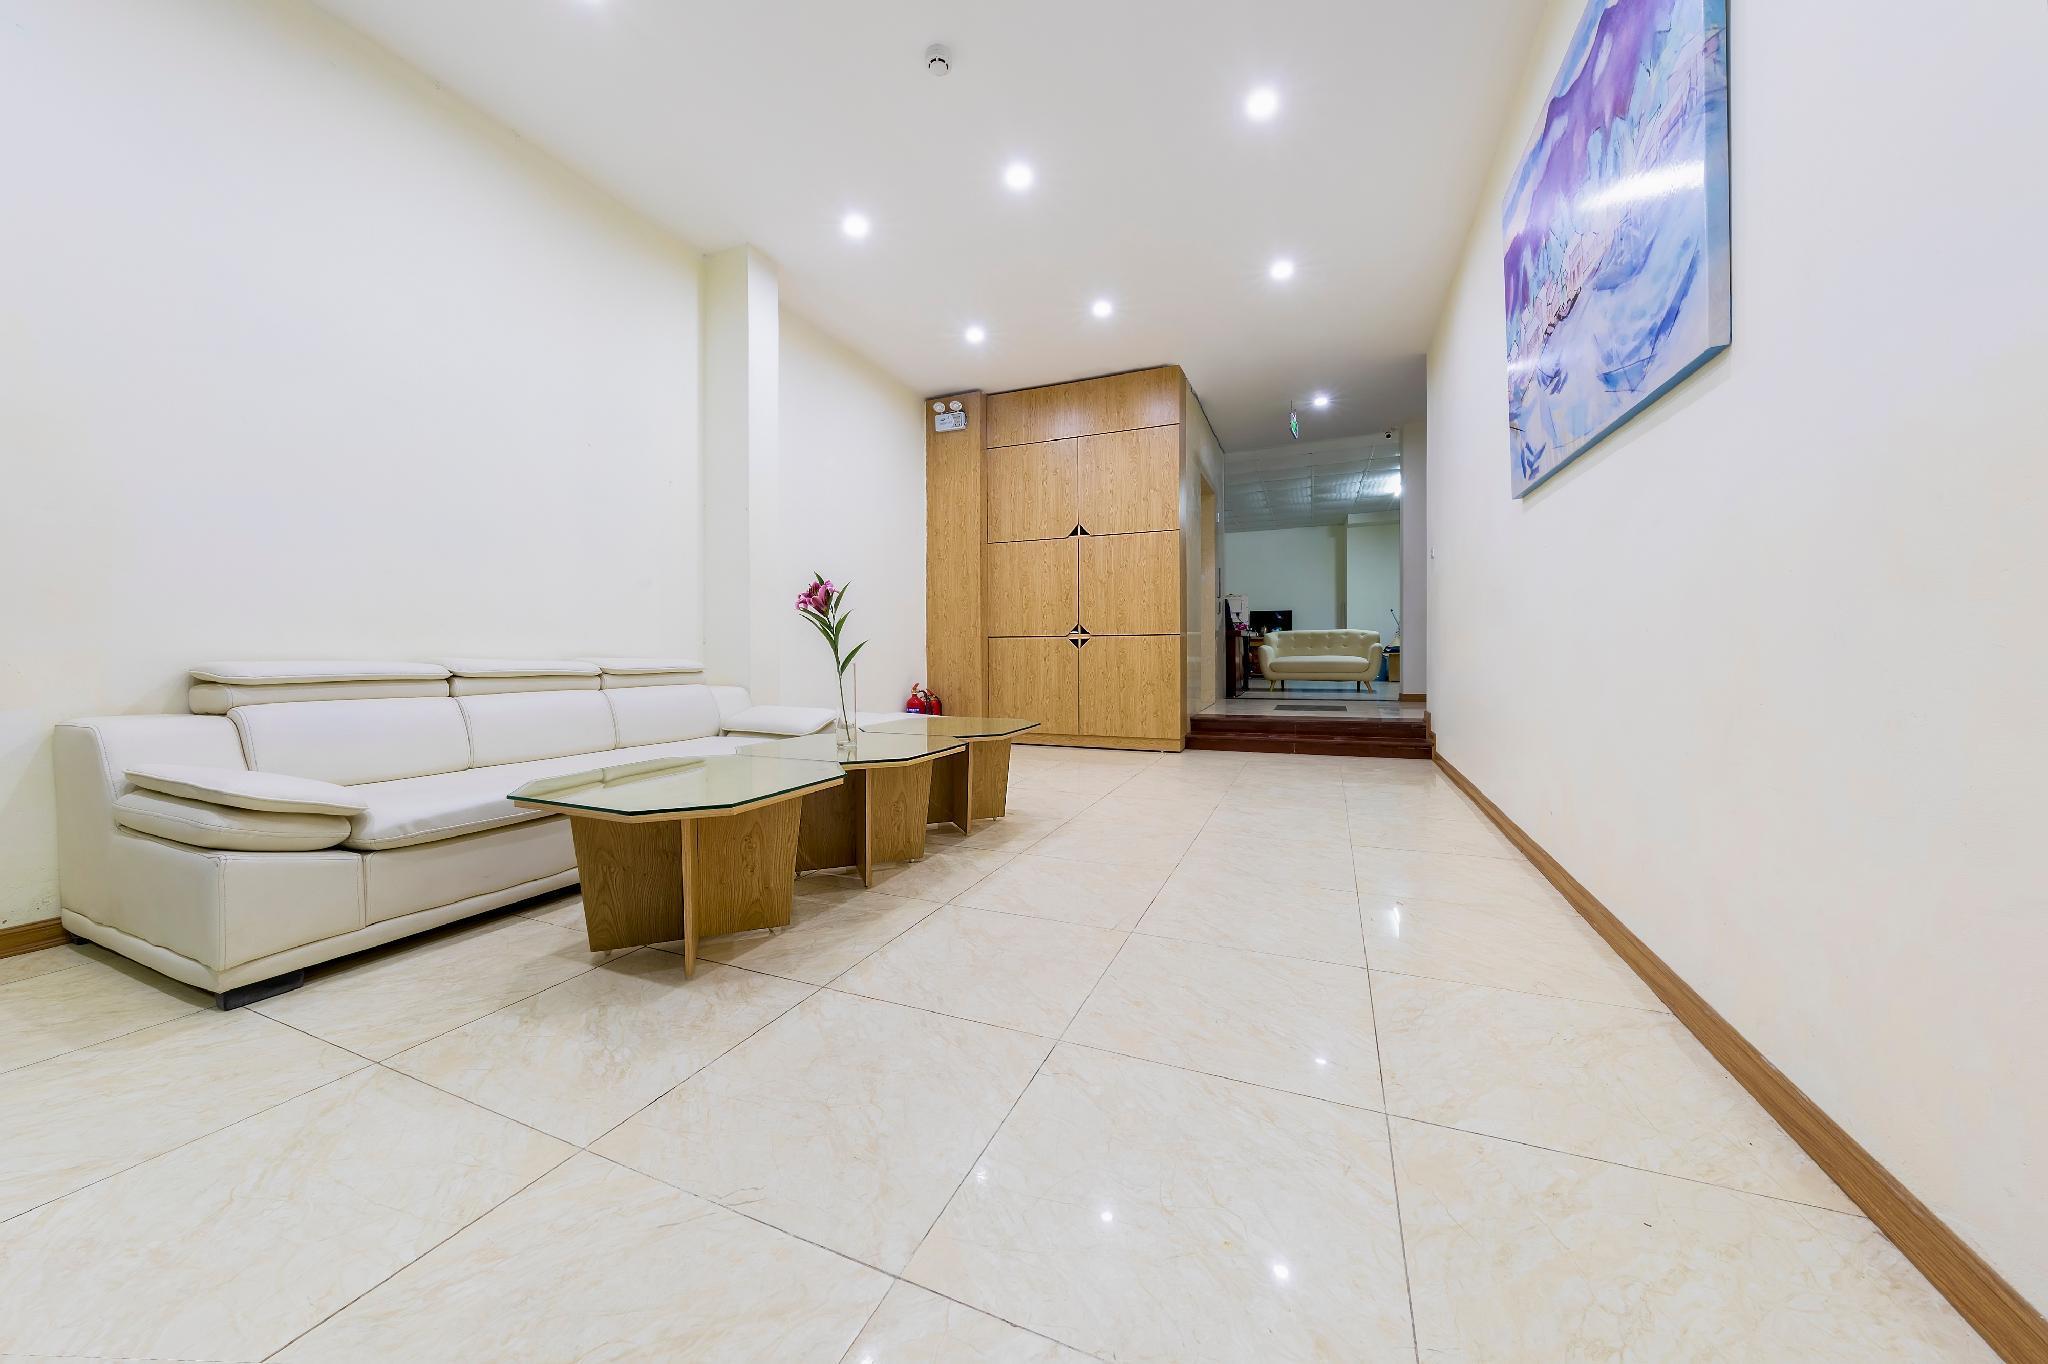 Granda Duy Tan Apartment Entire apartment (Hanoi) - Deals, Photos & Reviews